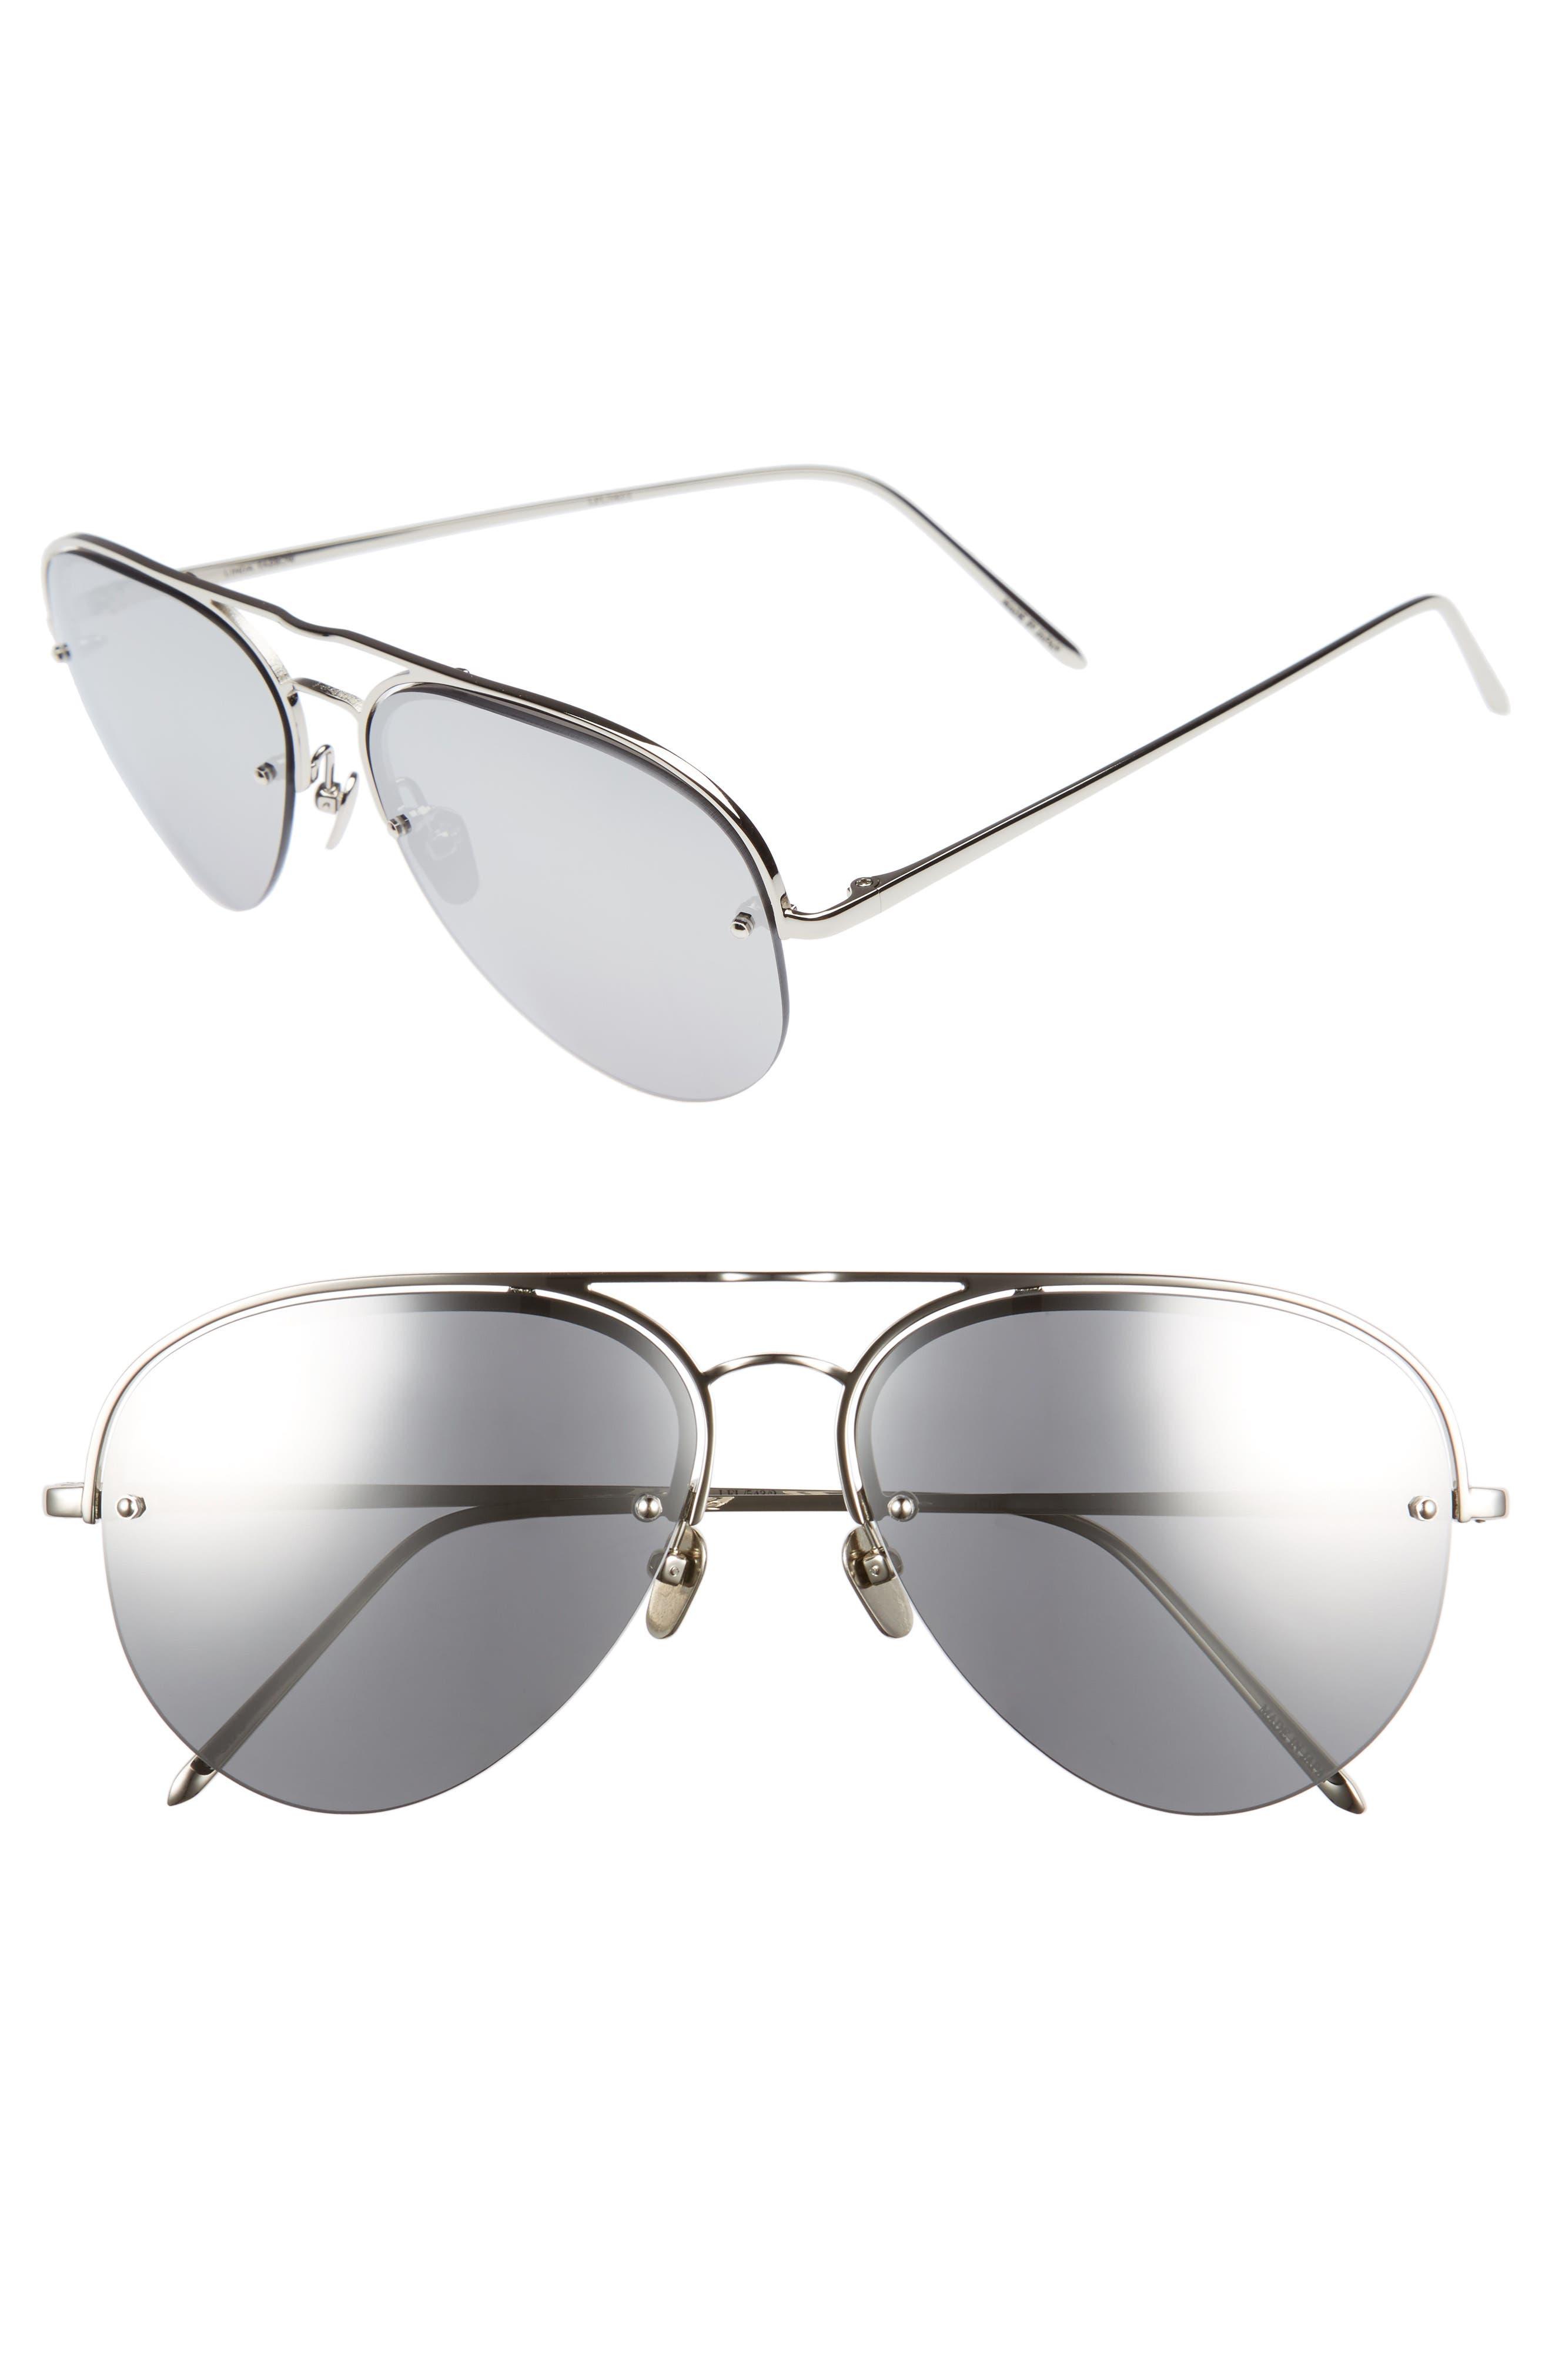 60mm Mirrored 18 Karat Gold Aviator Sunglasses,                             Main thumbnail 1, color,                             710